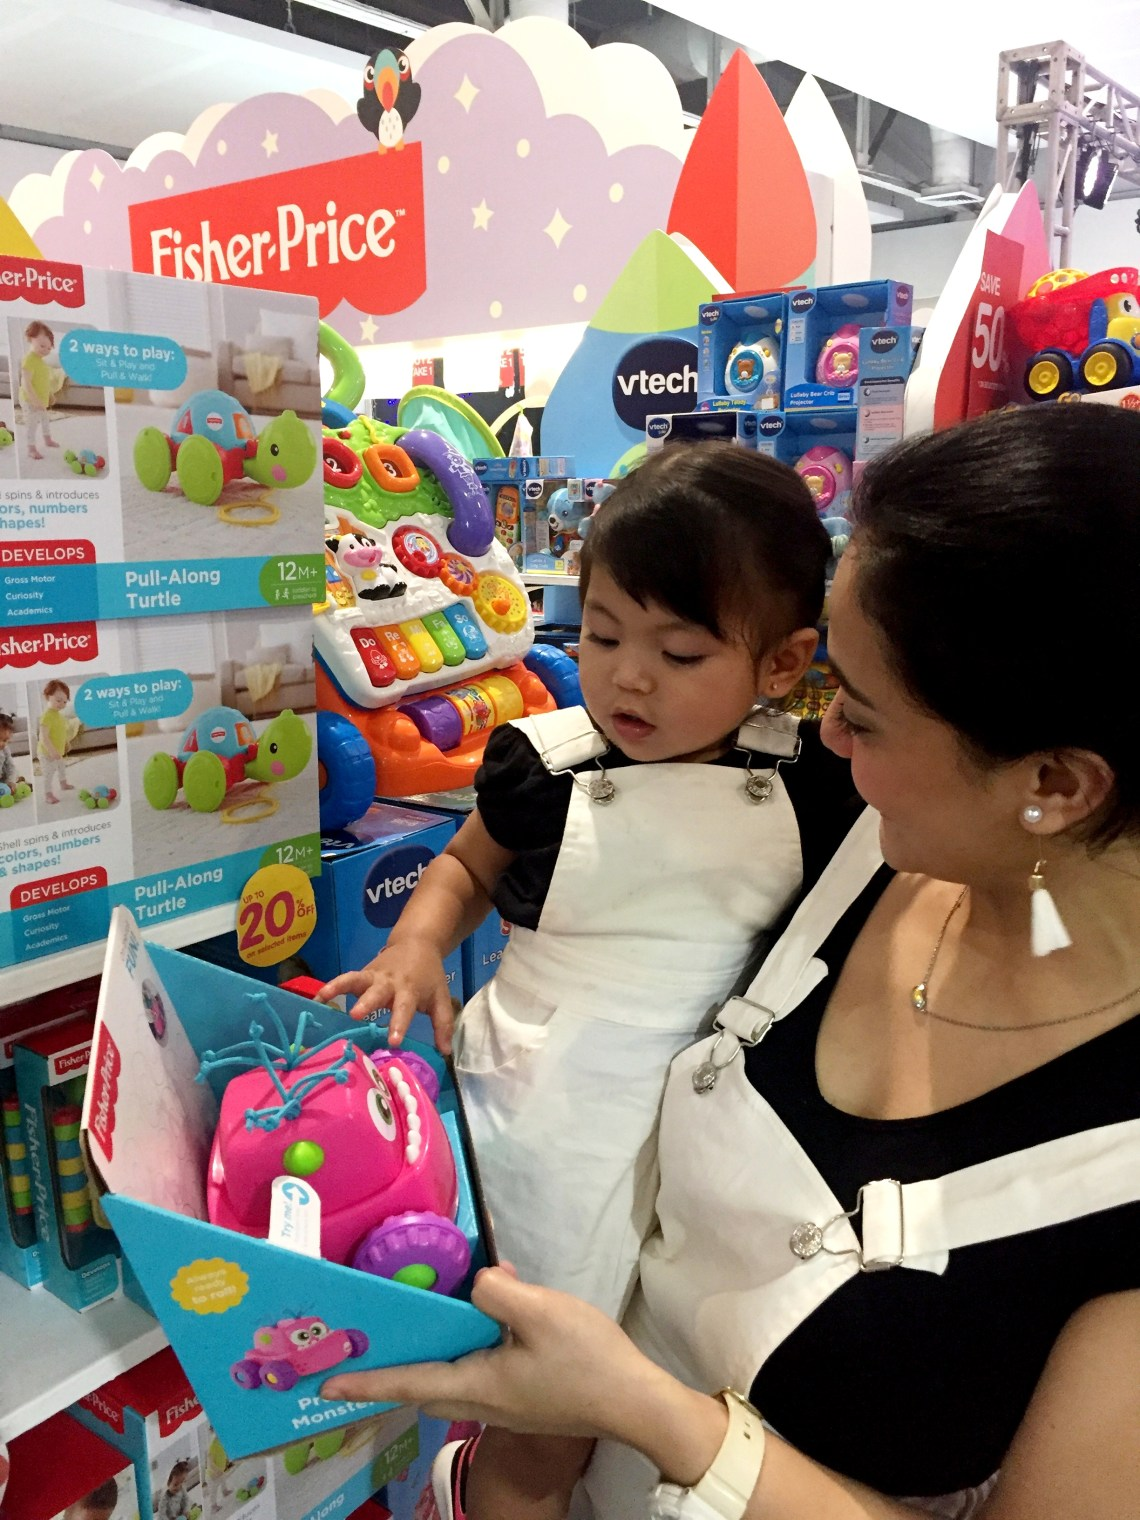 dyosathemomma: Baby Company Grand Baby Fair Year 8 SM Megatrade Hall, Fisher Price